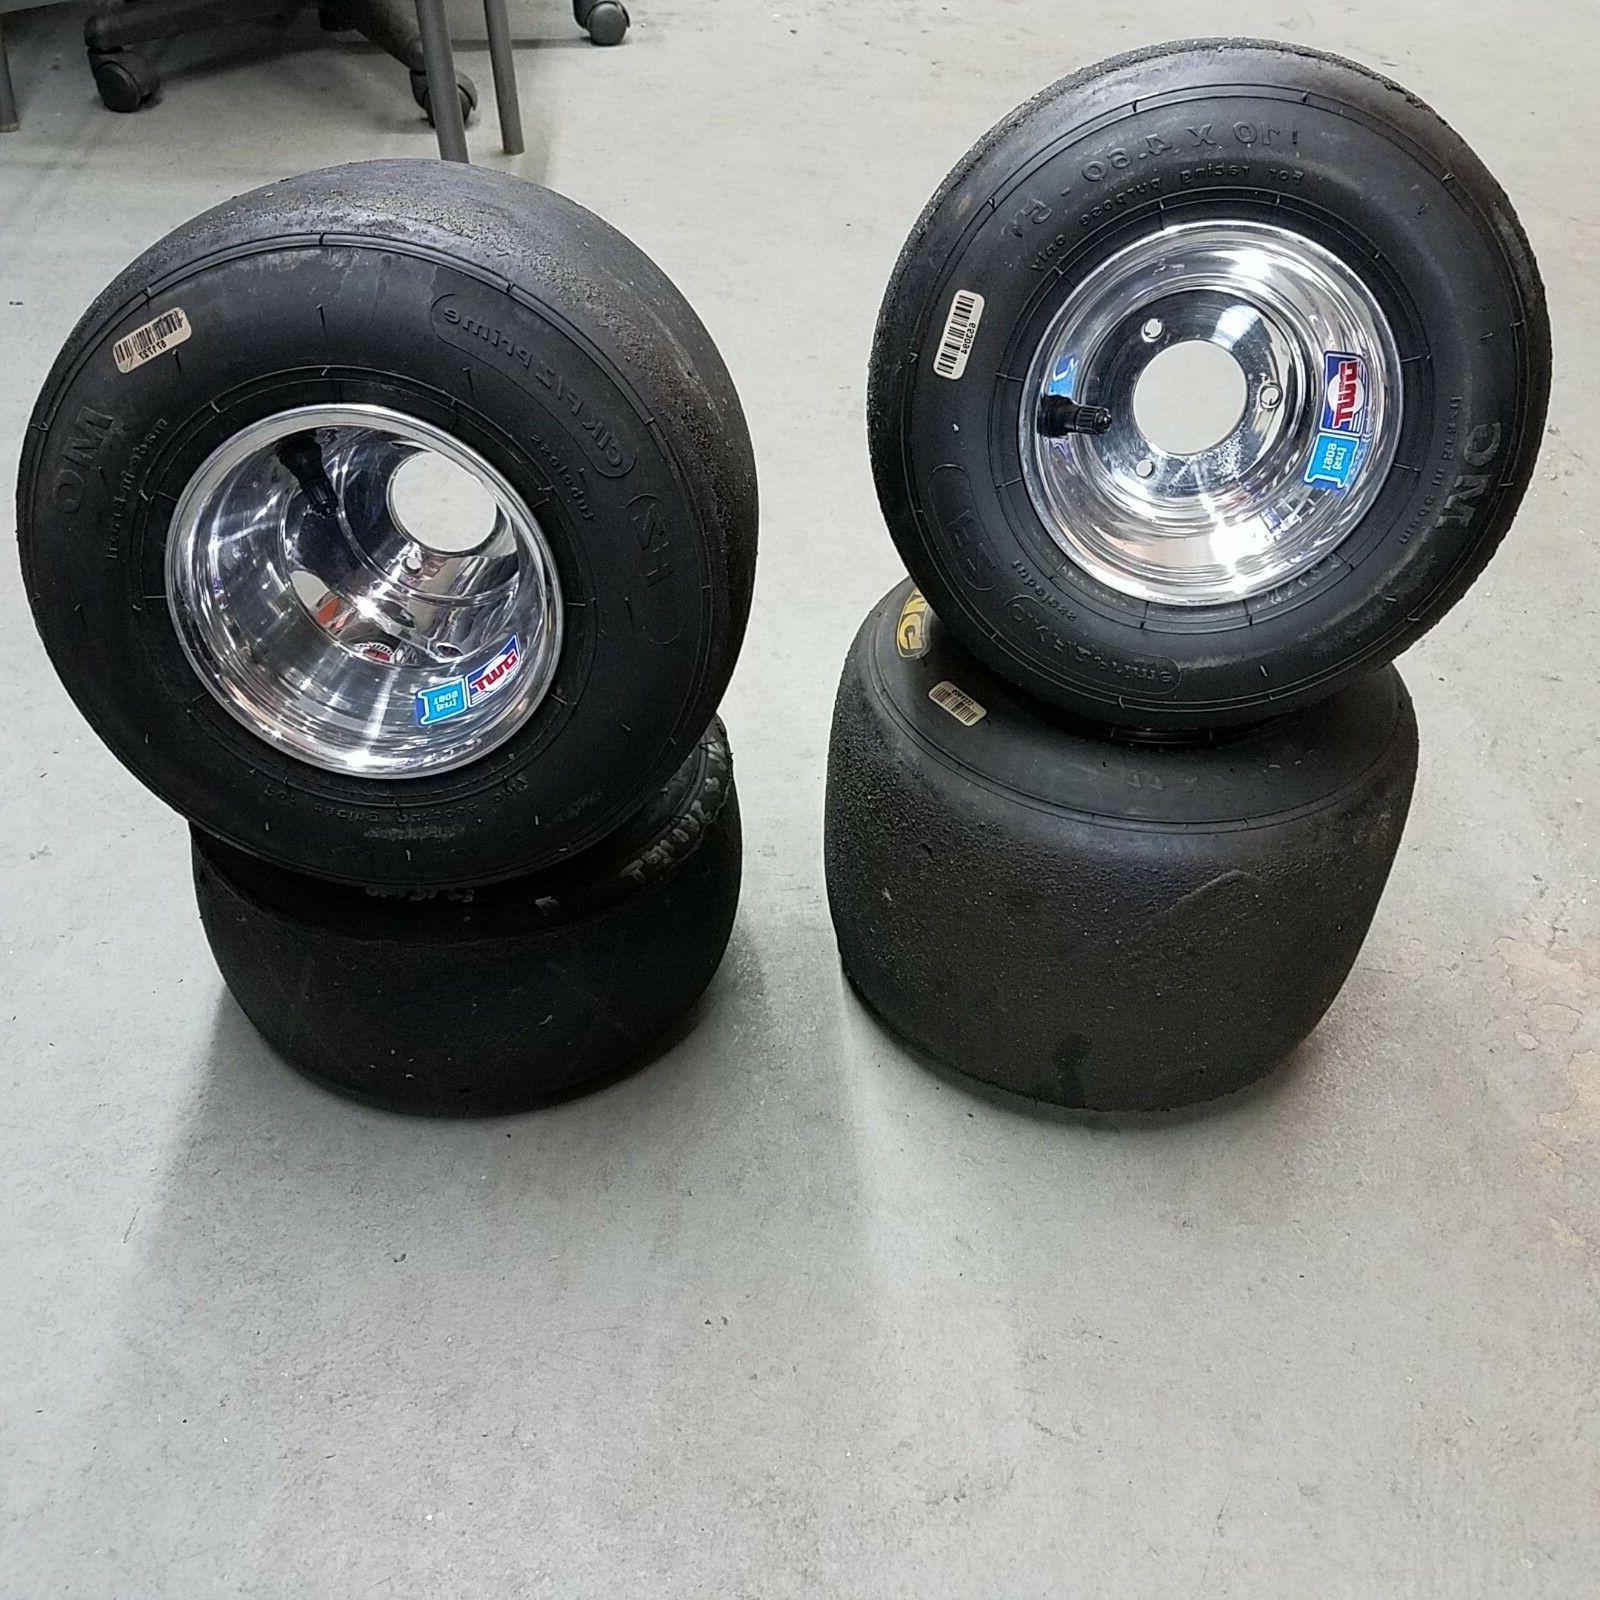 Go Kart Wheels, Go Kart Tires, Radio Flyer Wagon Tires, Comp